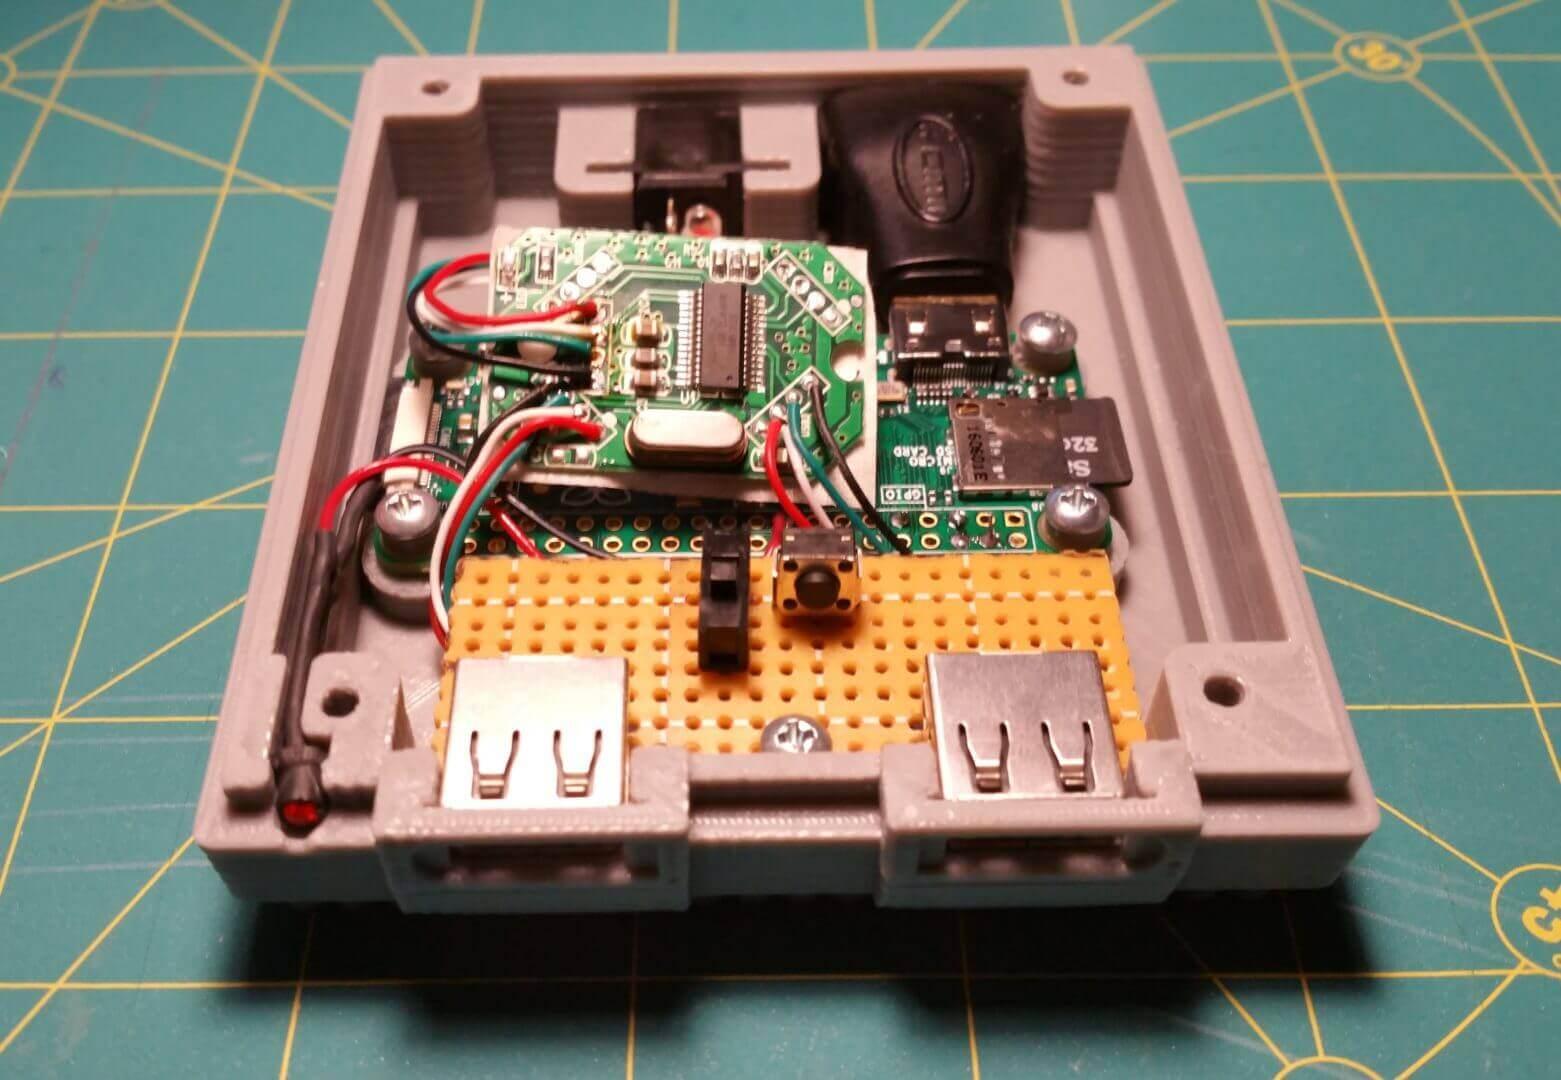 How To 3d Print A Super Nintendo Mini With Retropie And Raspberry Pi Wiring Diagram